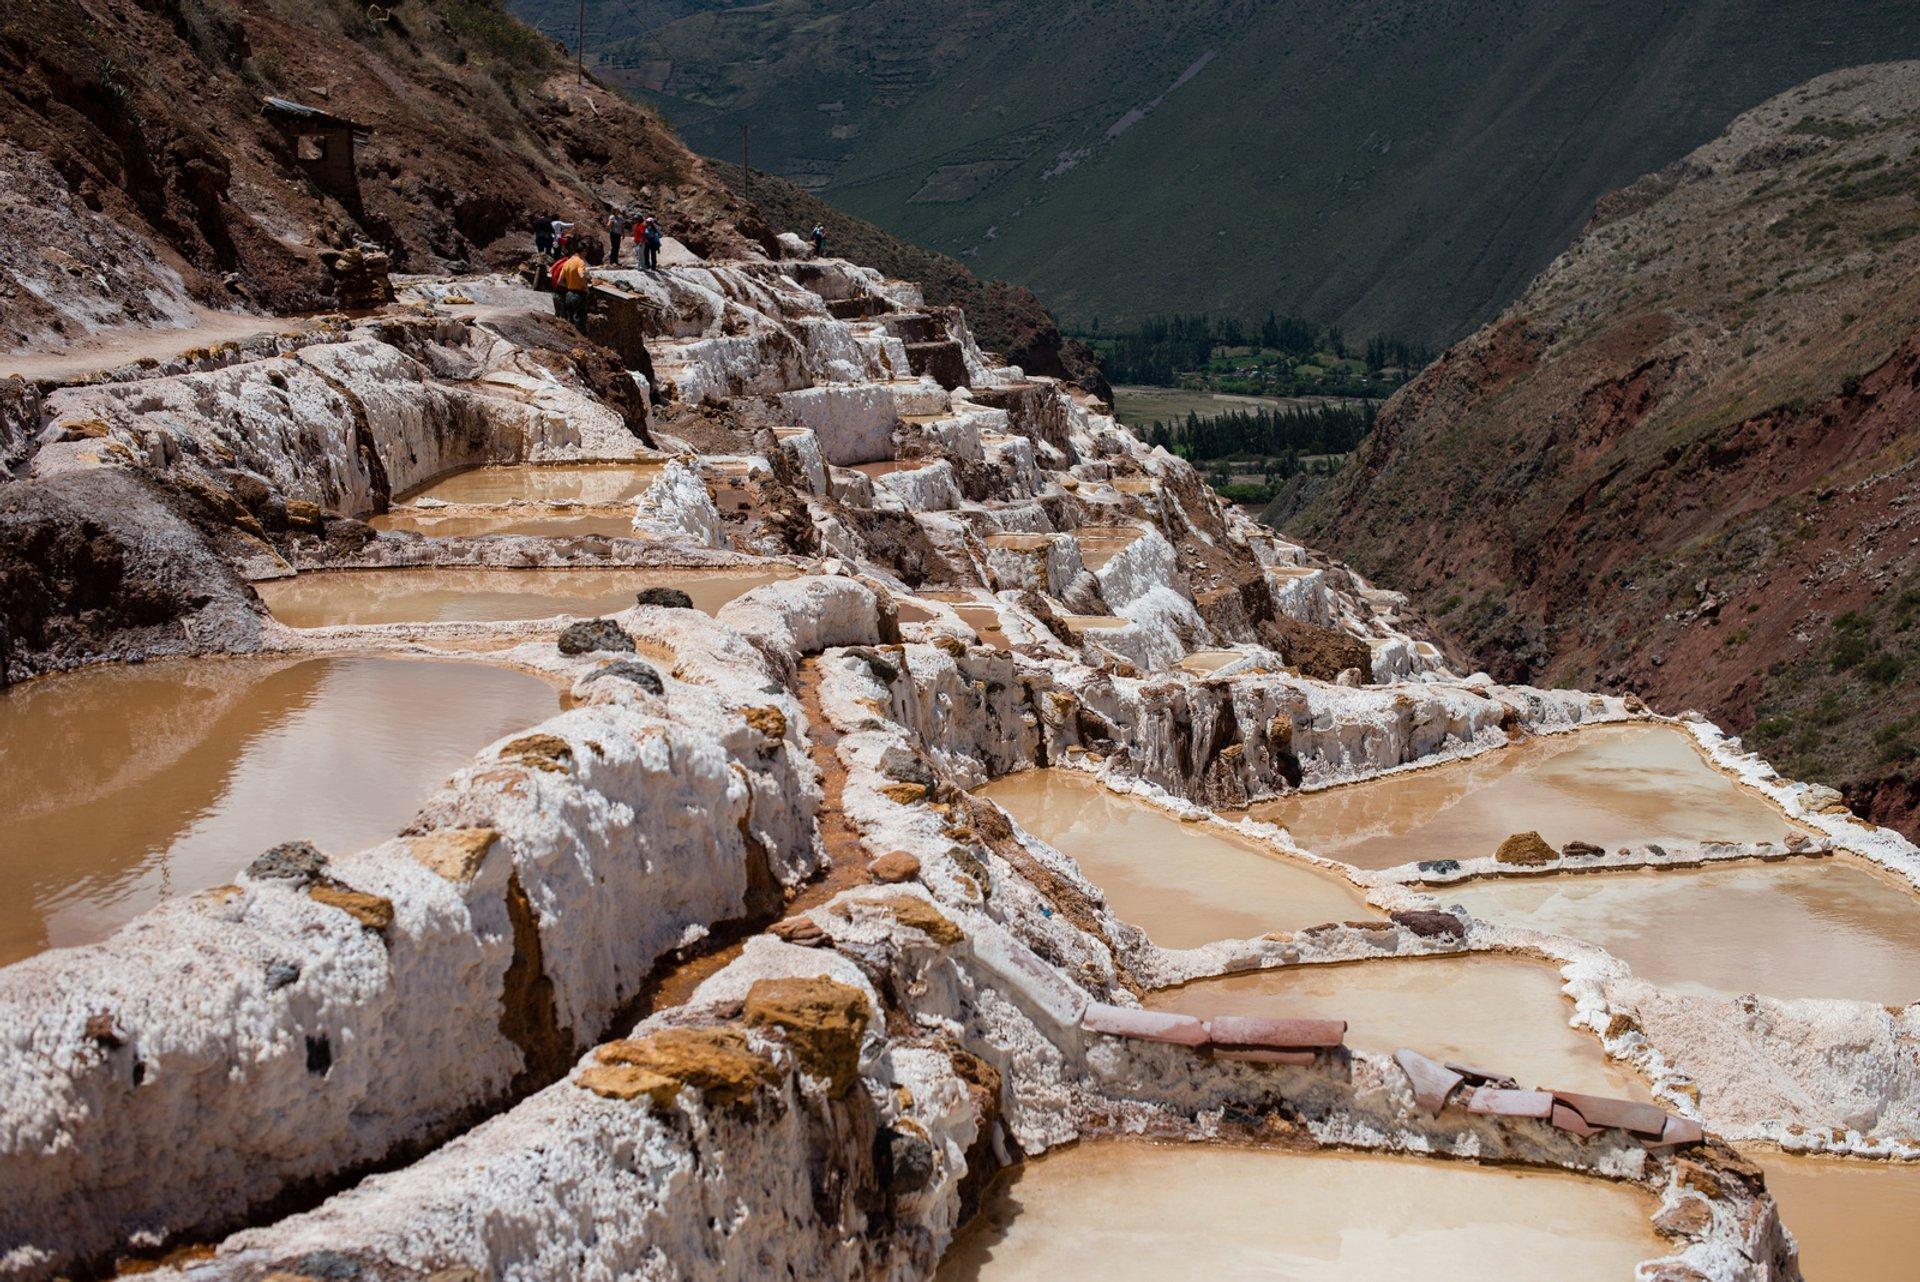 Salt Harvest at Salinas de Maras in Peru - Best Season 2020